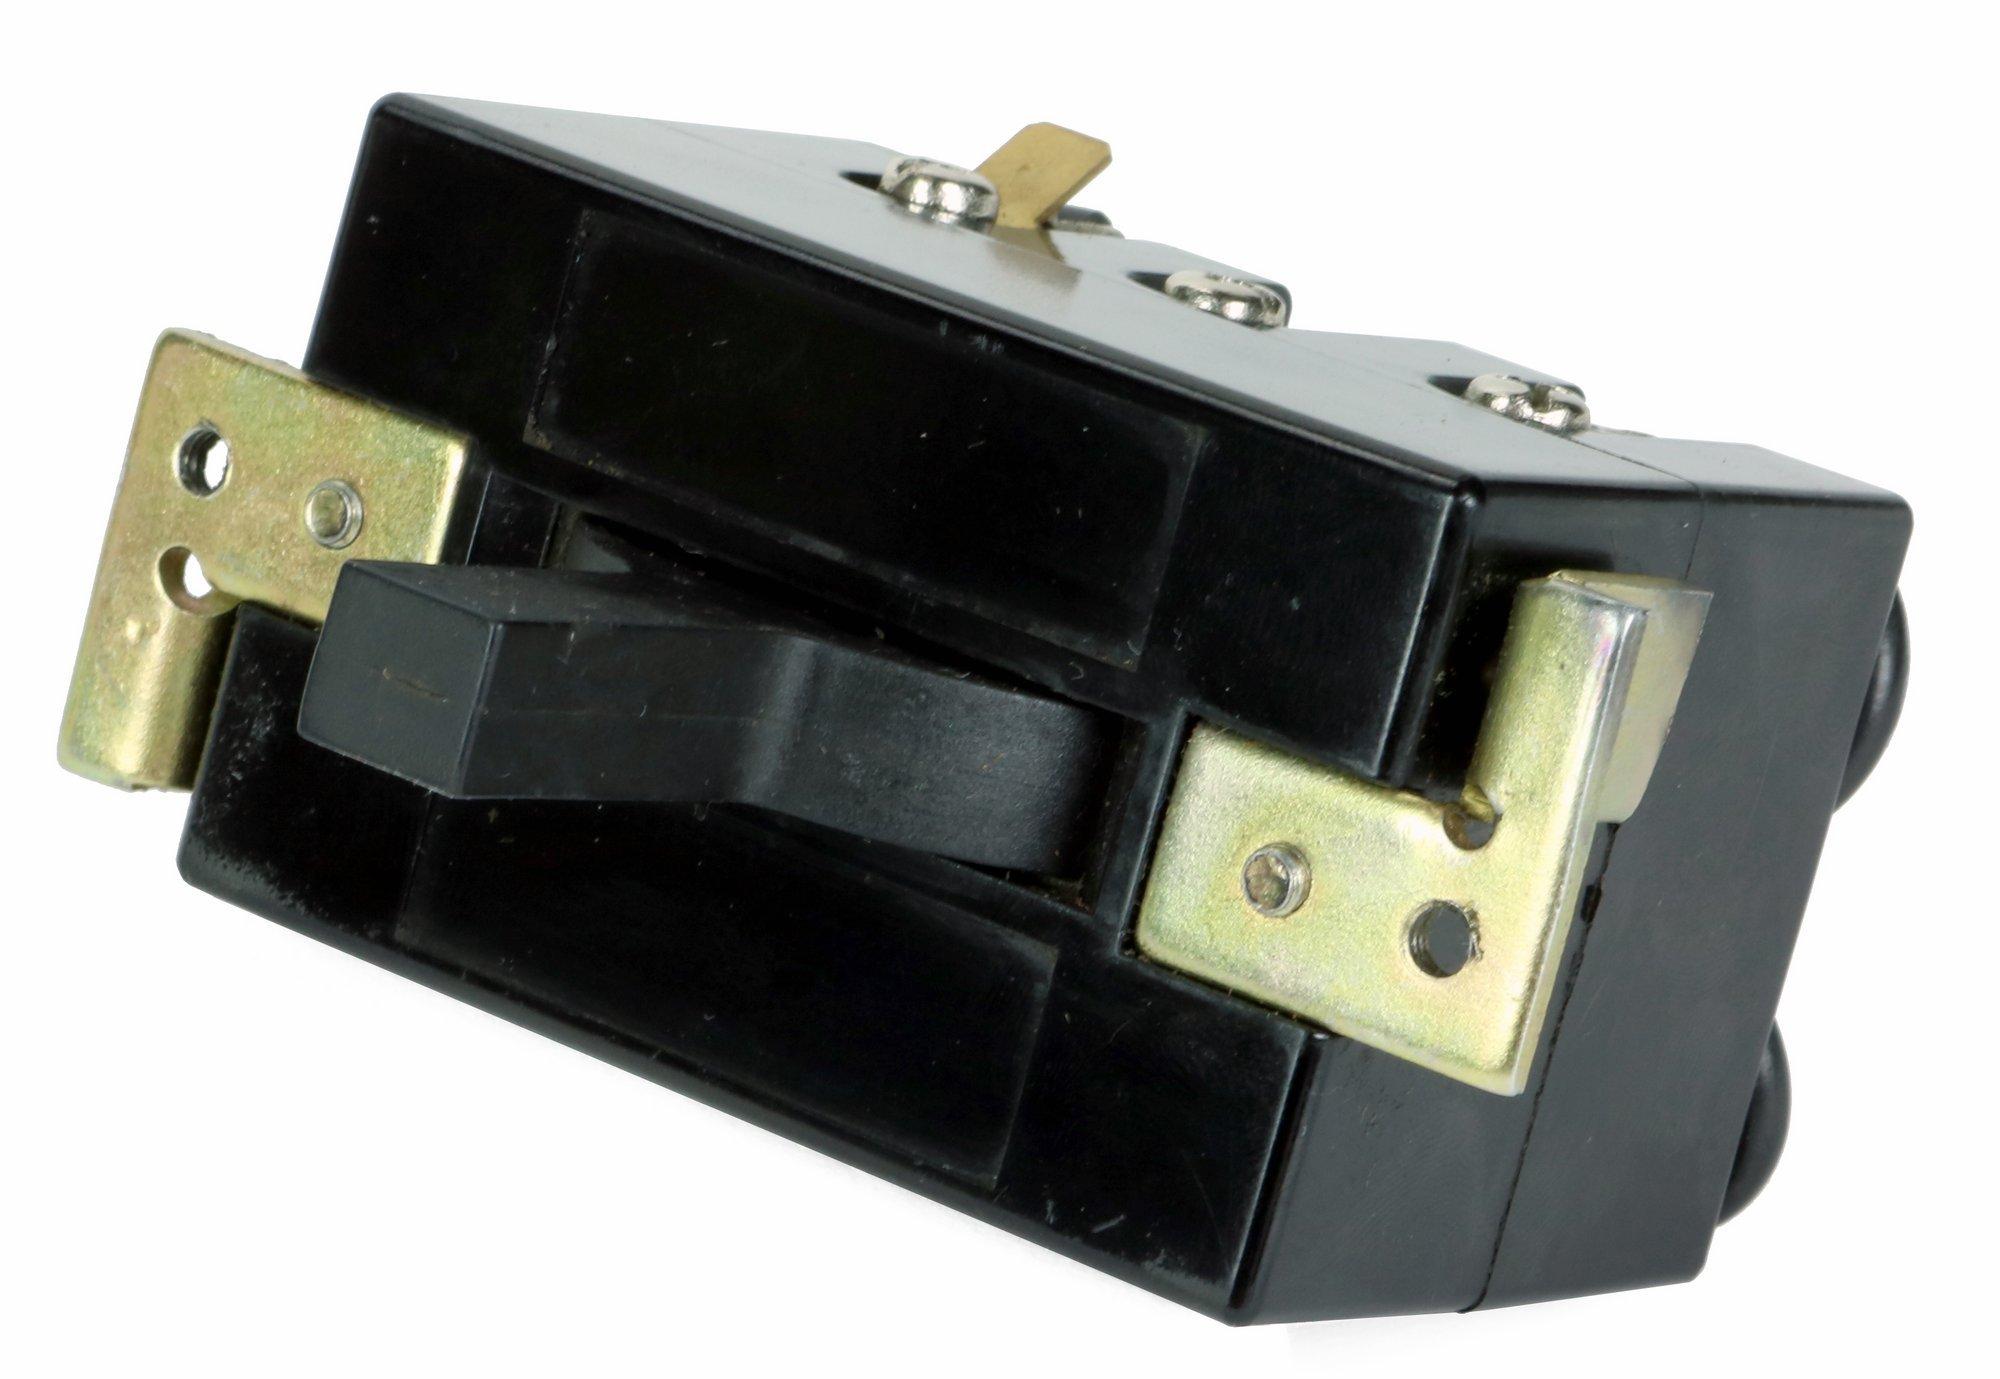 Toledo Pipe 44505 E1417 FWD/REV Switch fits RIDGID 300 535 Pipe Threading Machine